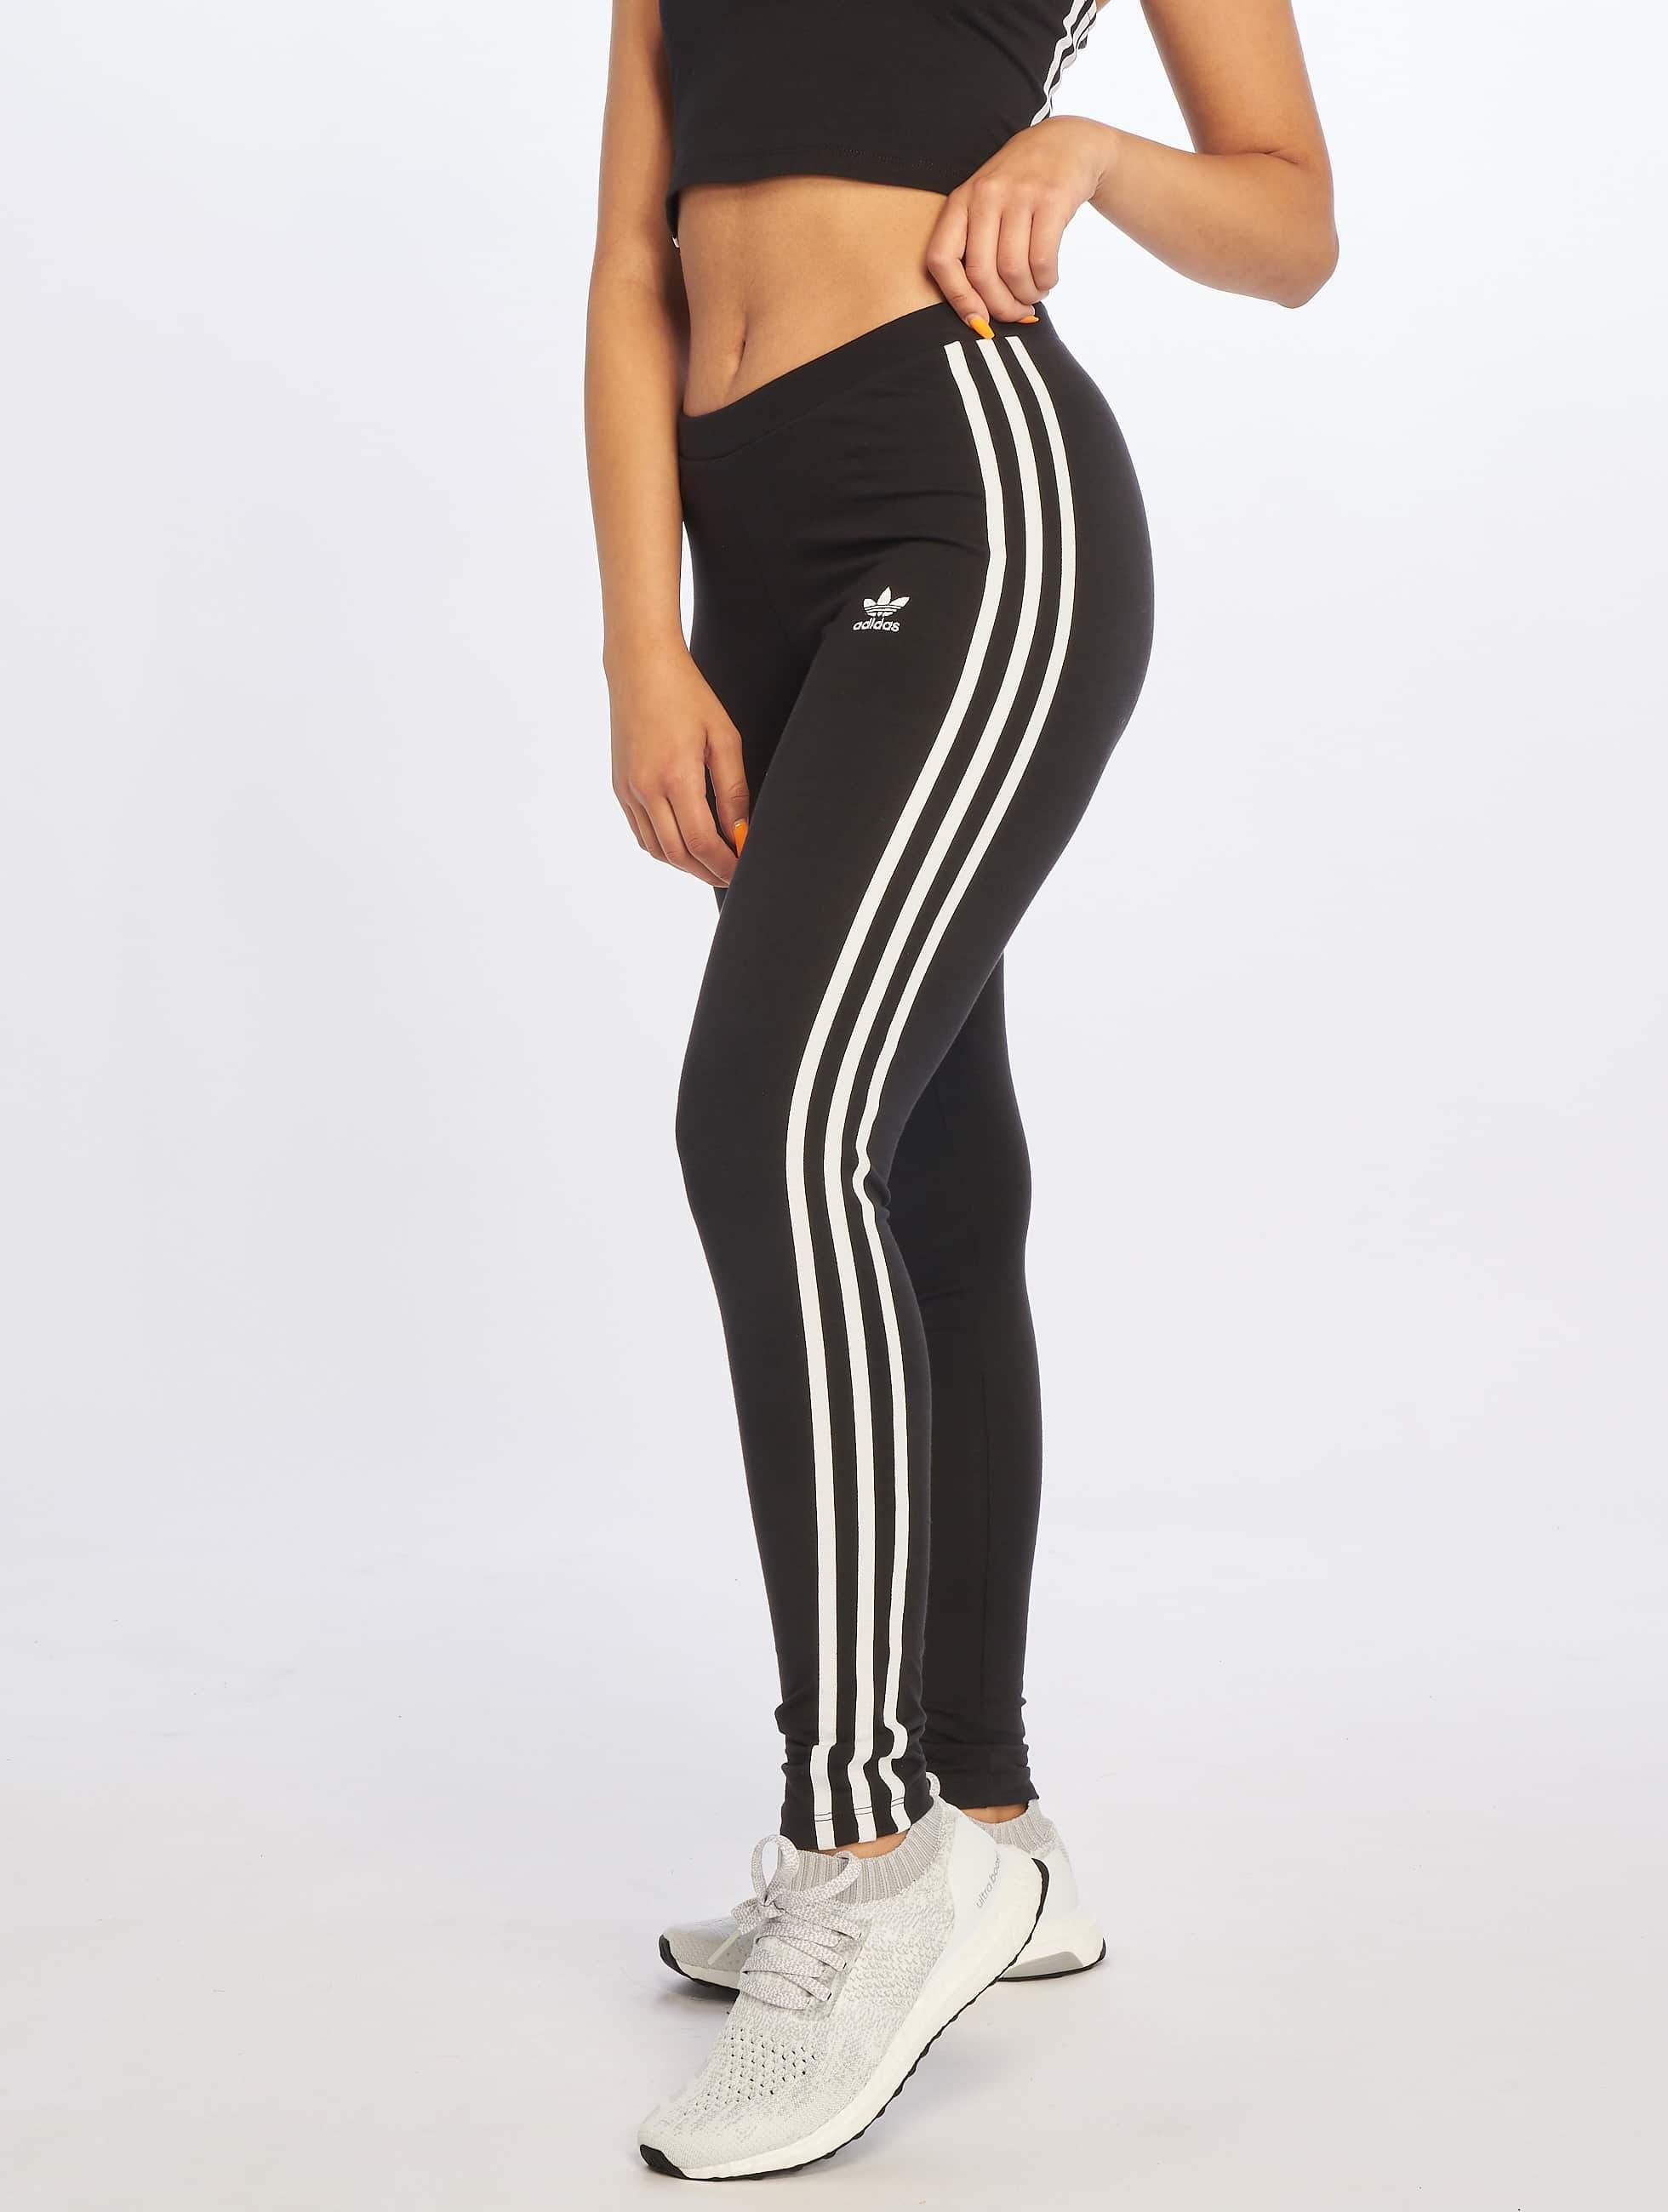 Details zu adidas originals Damen Hosen Legging 3 Stripes